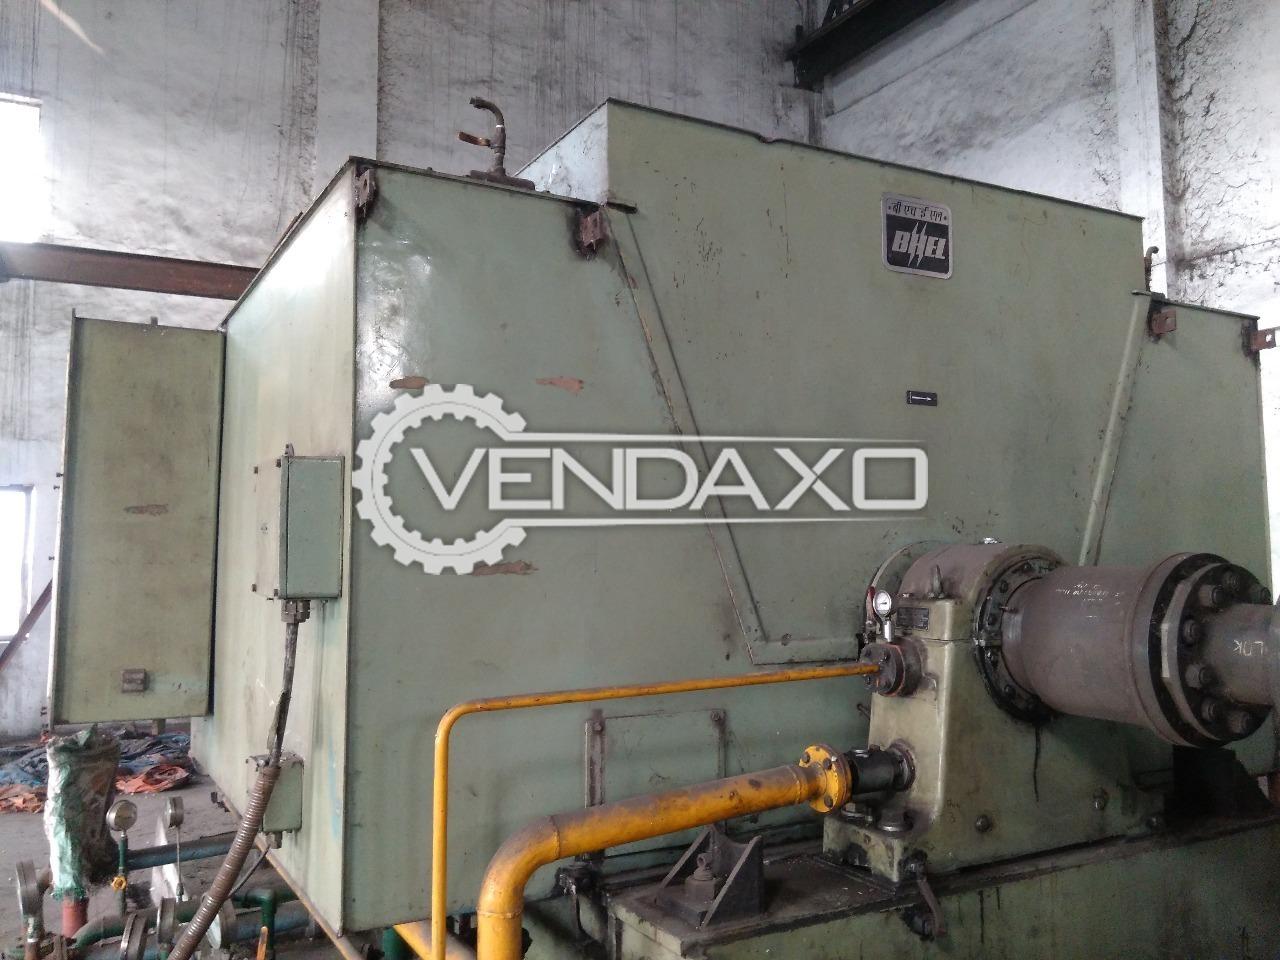 Bhel Syncronous Generator - 10,000 KVA